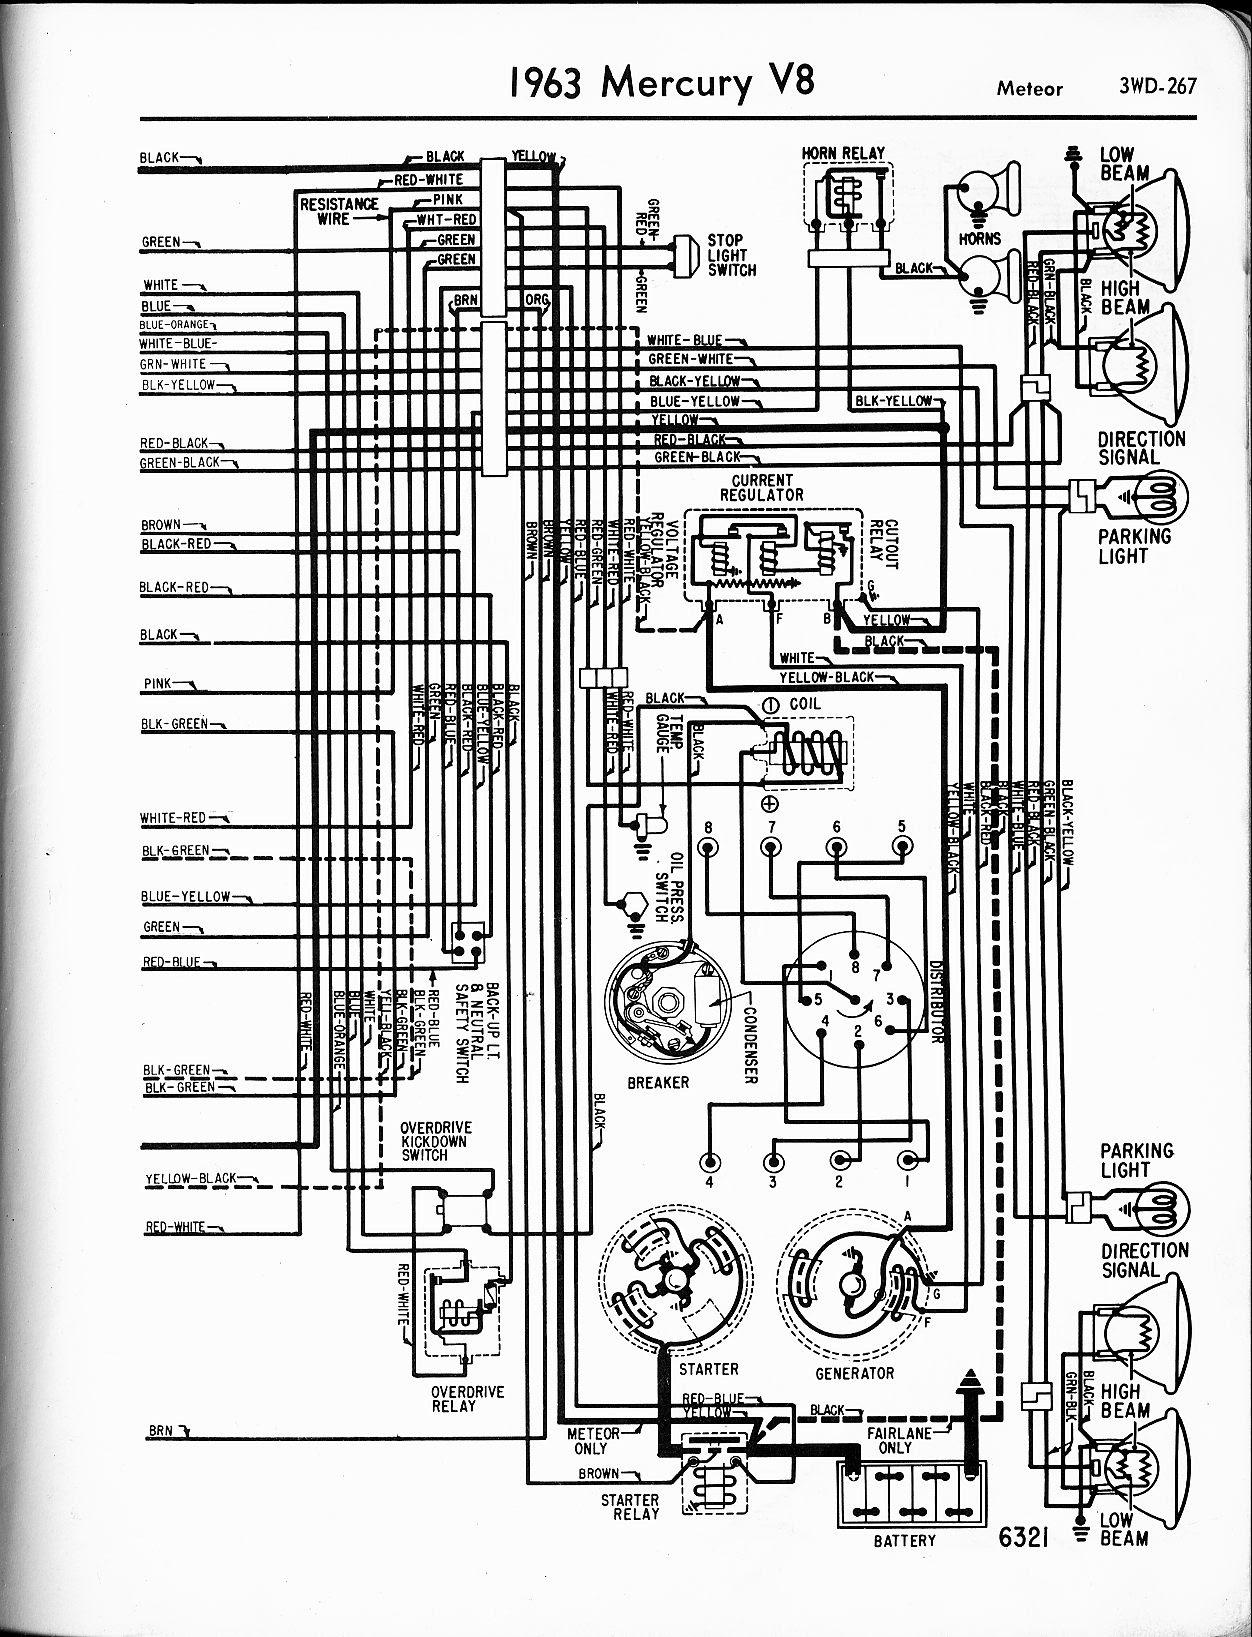 1955 Chevy Starter Wiring Diagram : Wiring Diagram Of 1955